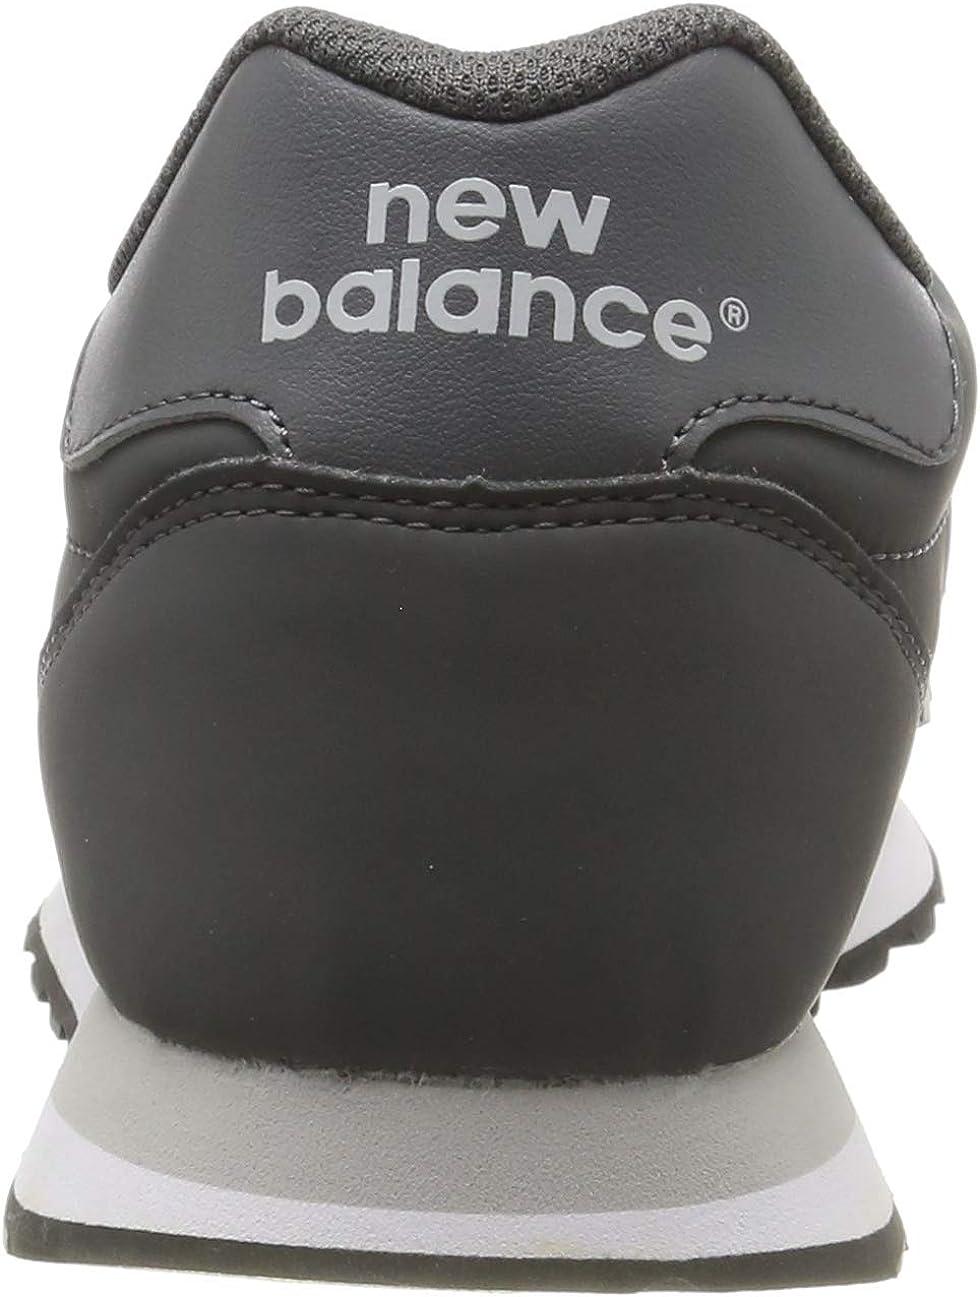 New Balance Gm500v1, Scarpe da Ginnastica Uomo : Amazon.it: Moda